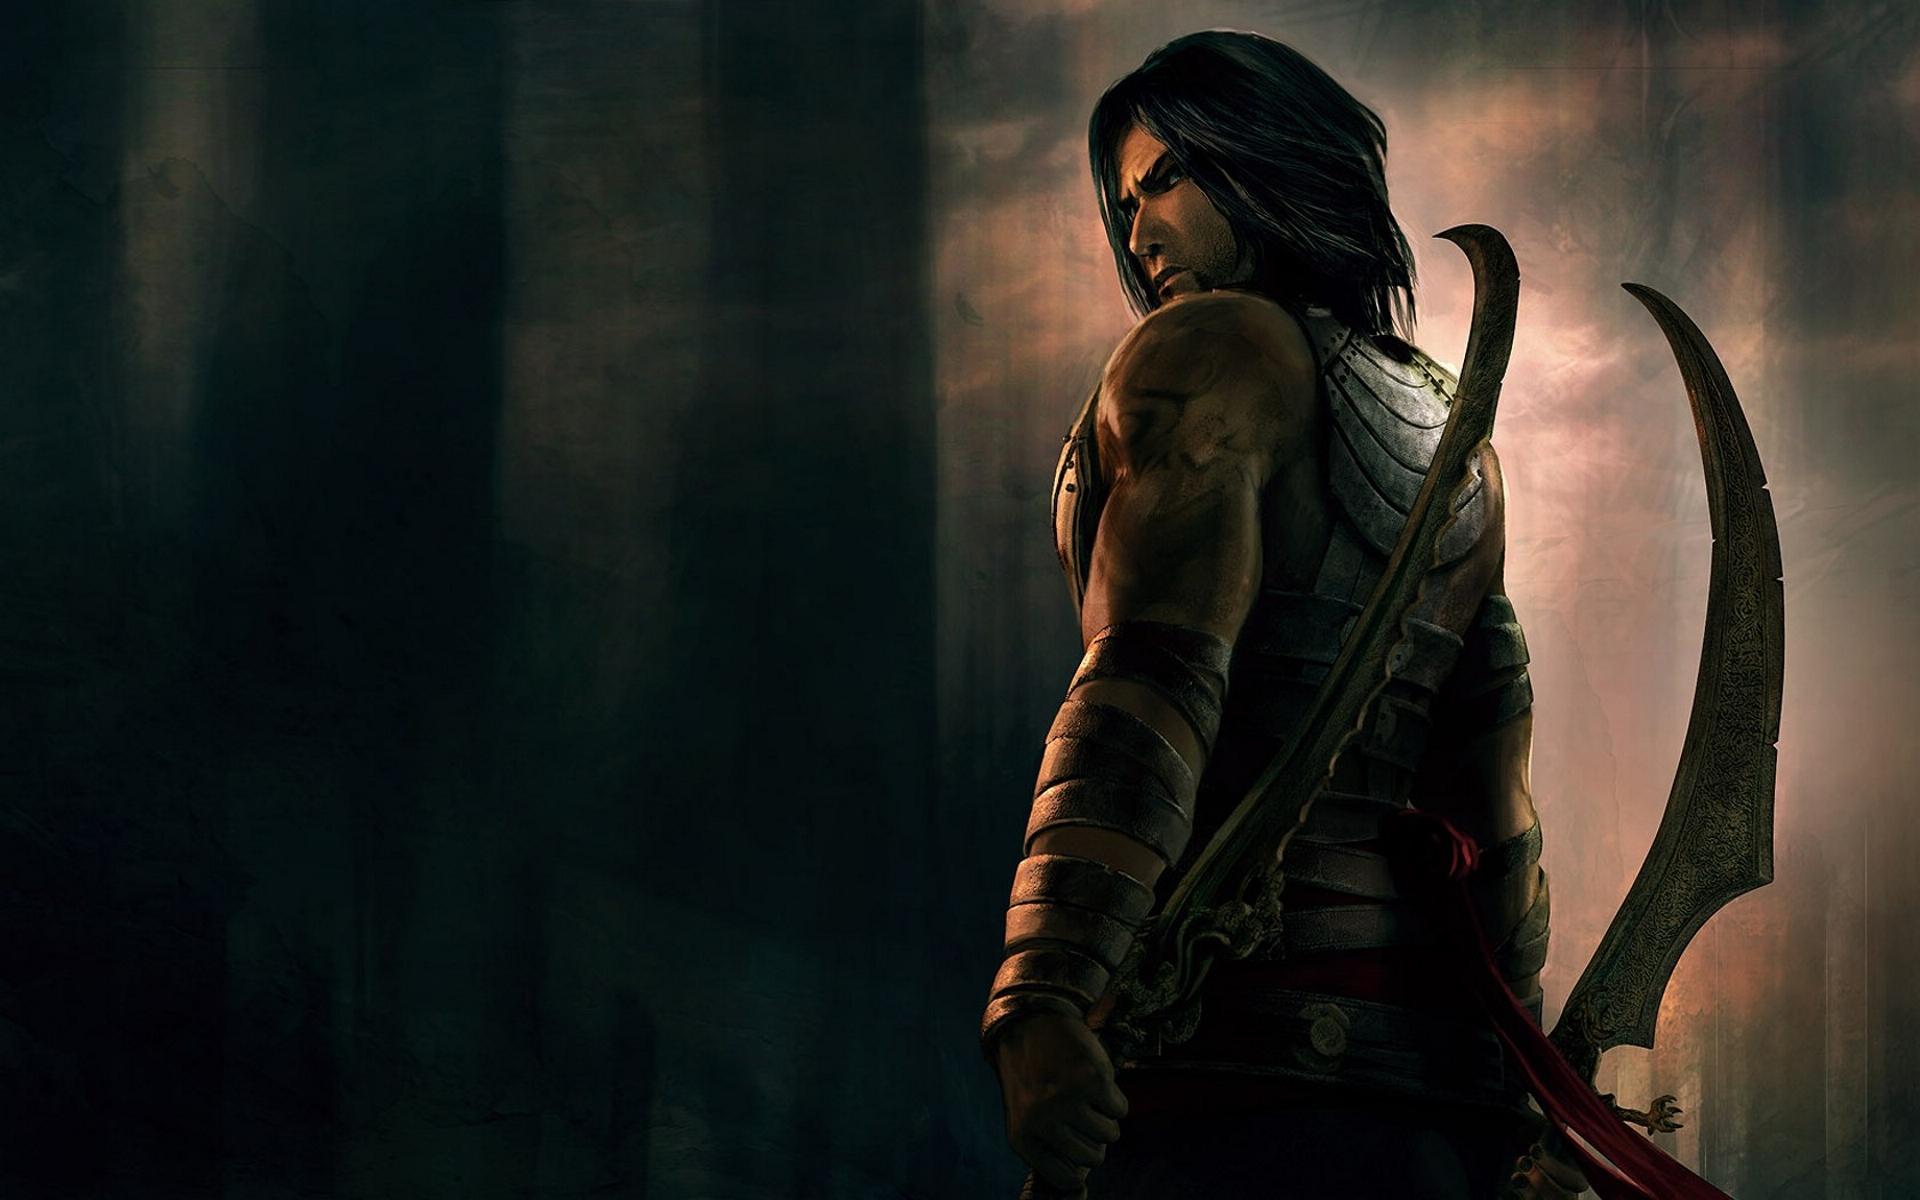 Арт к игре Prince of Persia: Warrior Within